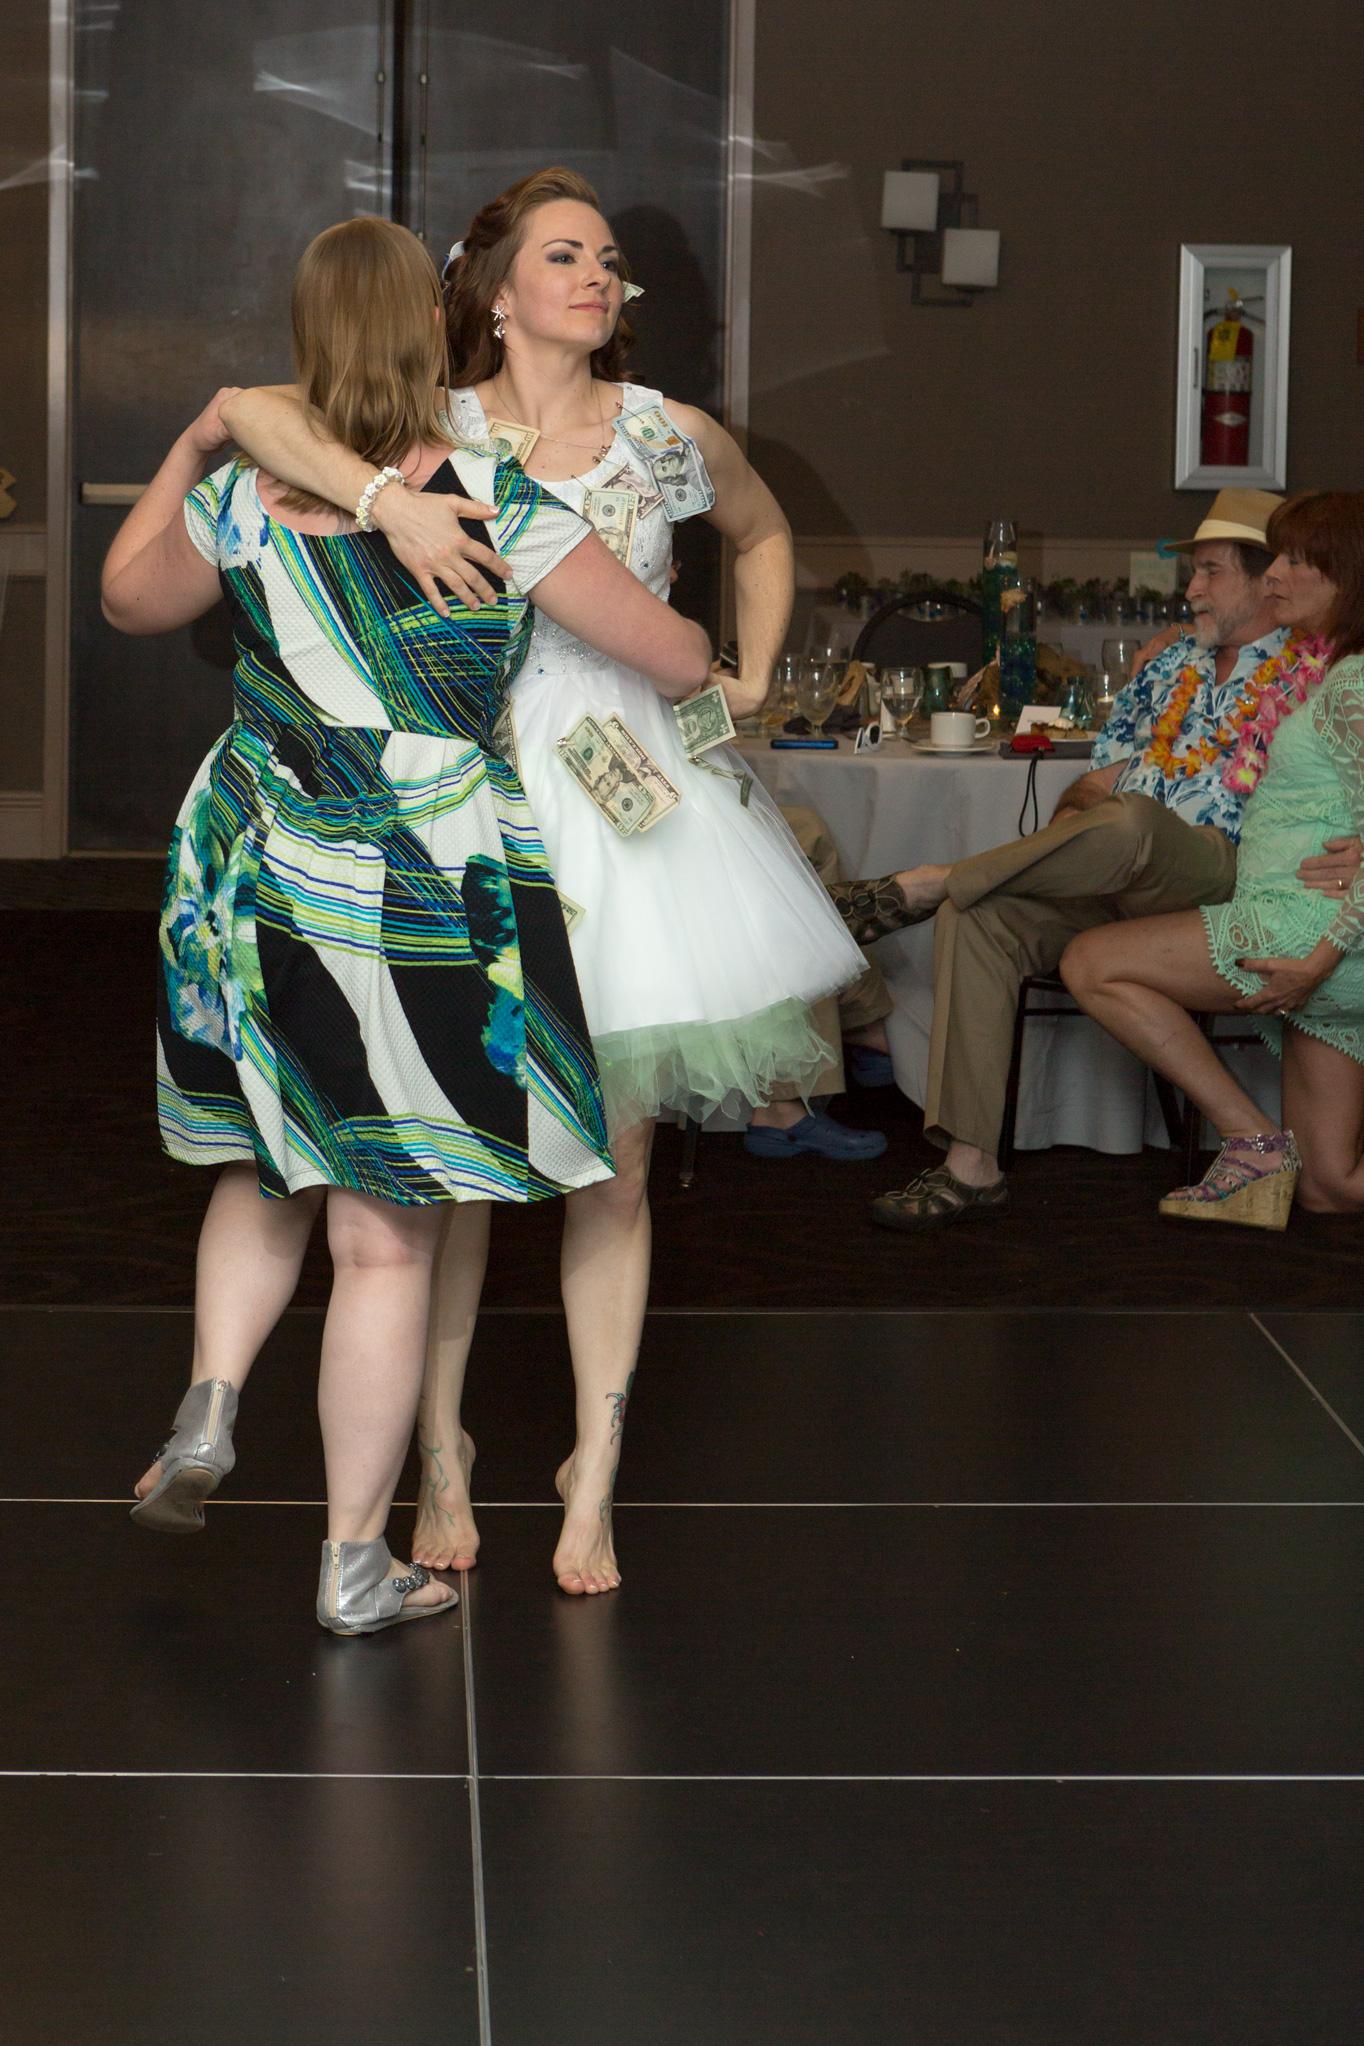 bride_groom_money_dance_reception_3.jpg